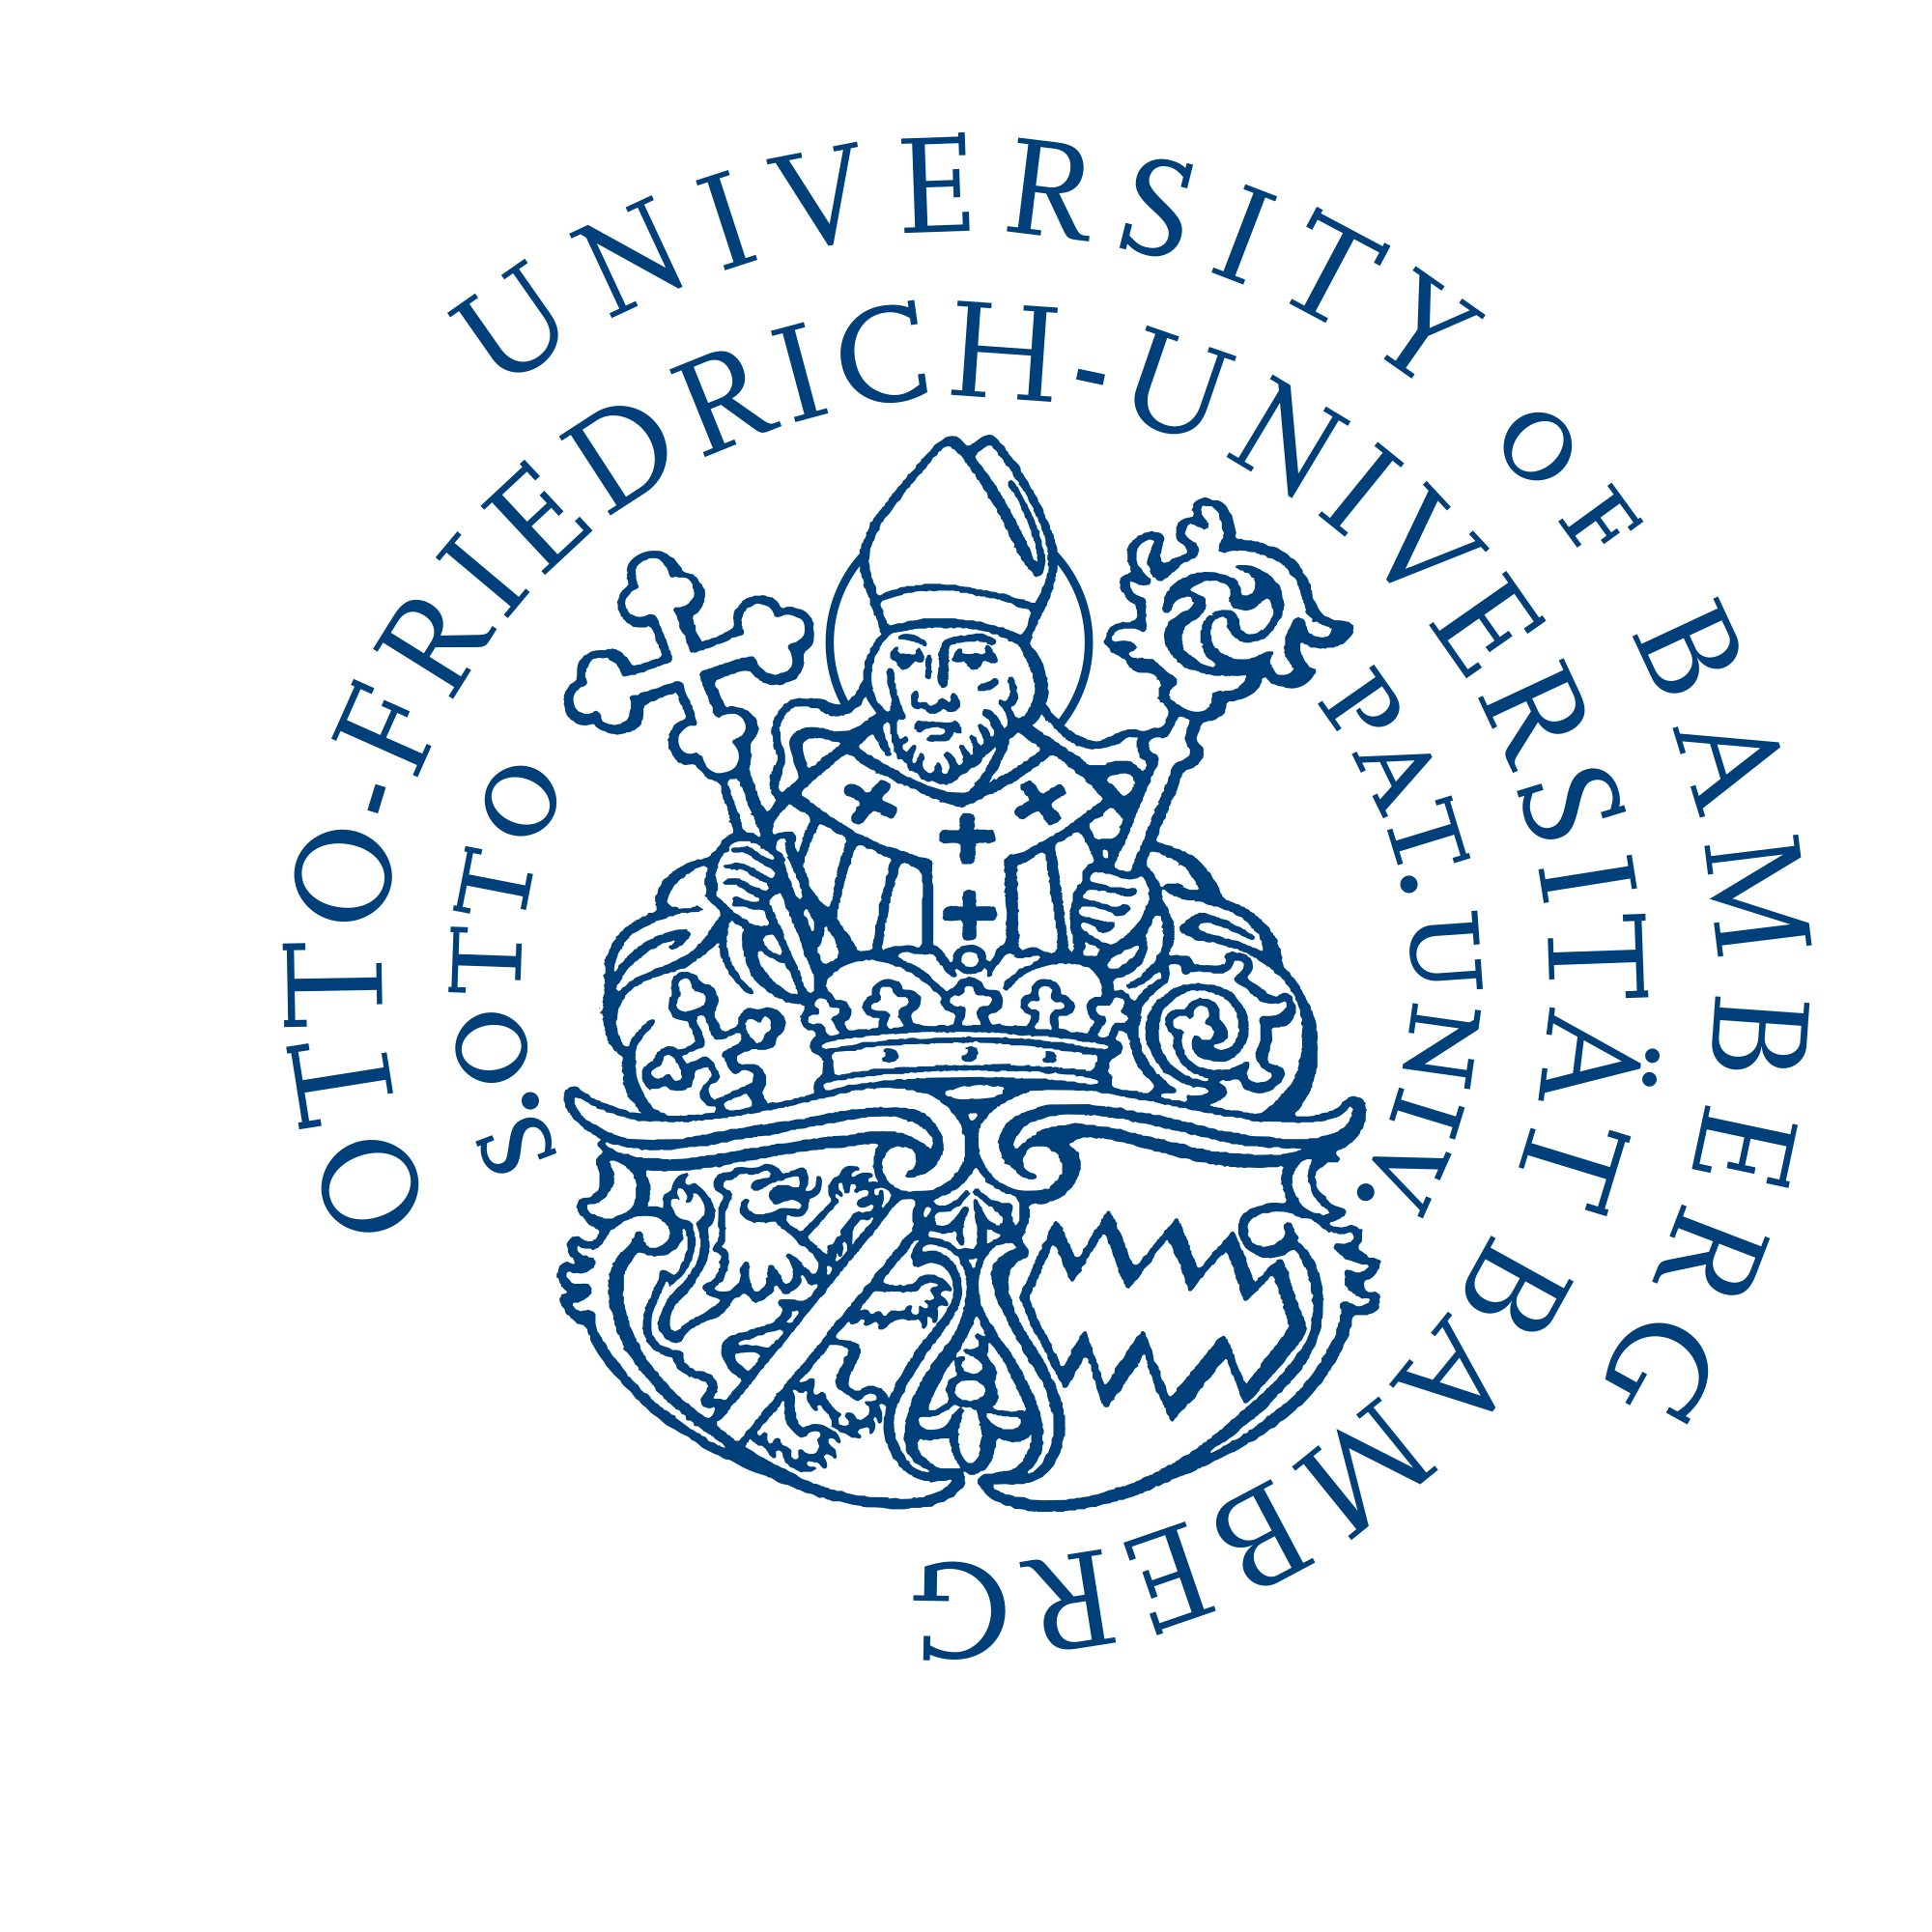 Logo Otto-Friedrich-Universität Bamberg